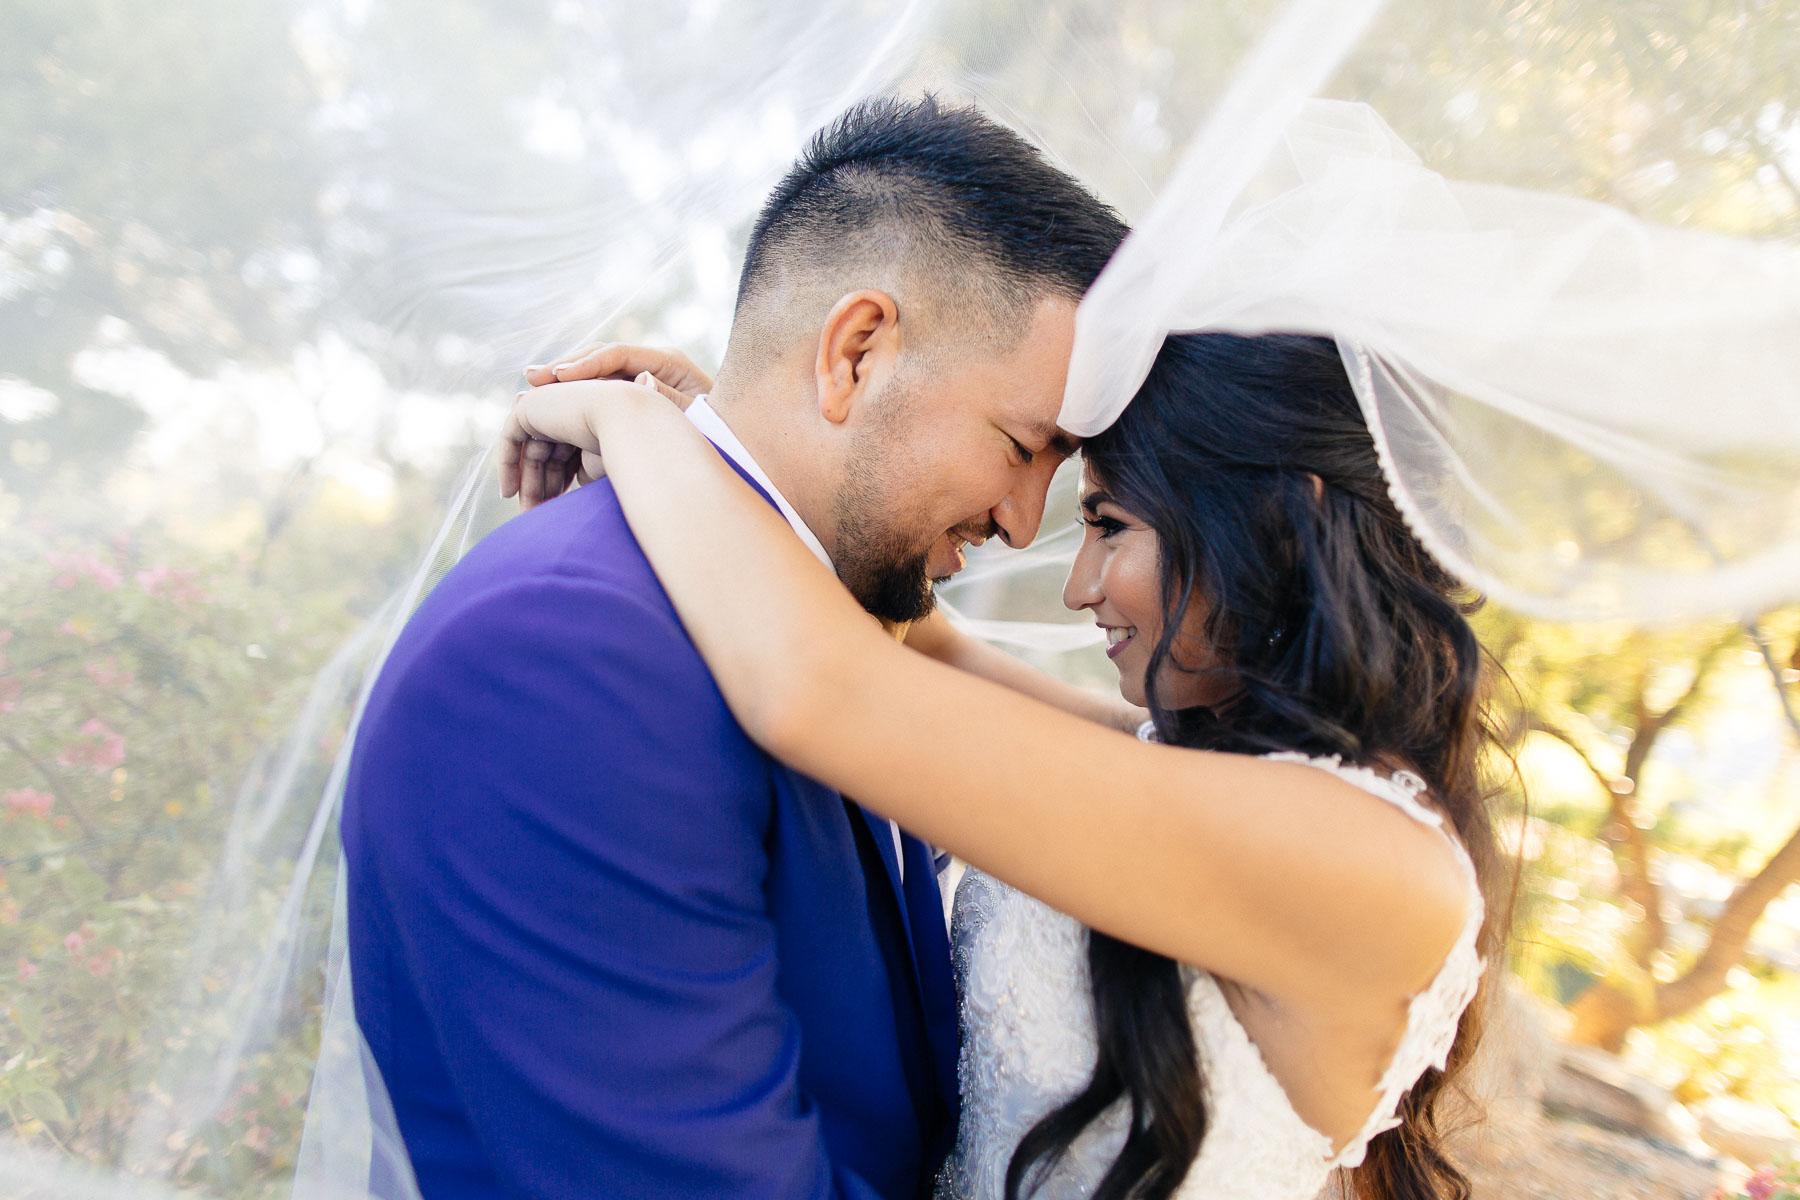 161029-Luxium-Weddings-Arizona-Jeff-Griselda-First-Look-Val-Vista-Lakes-Gilber-053.jpg